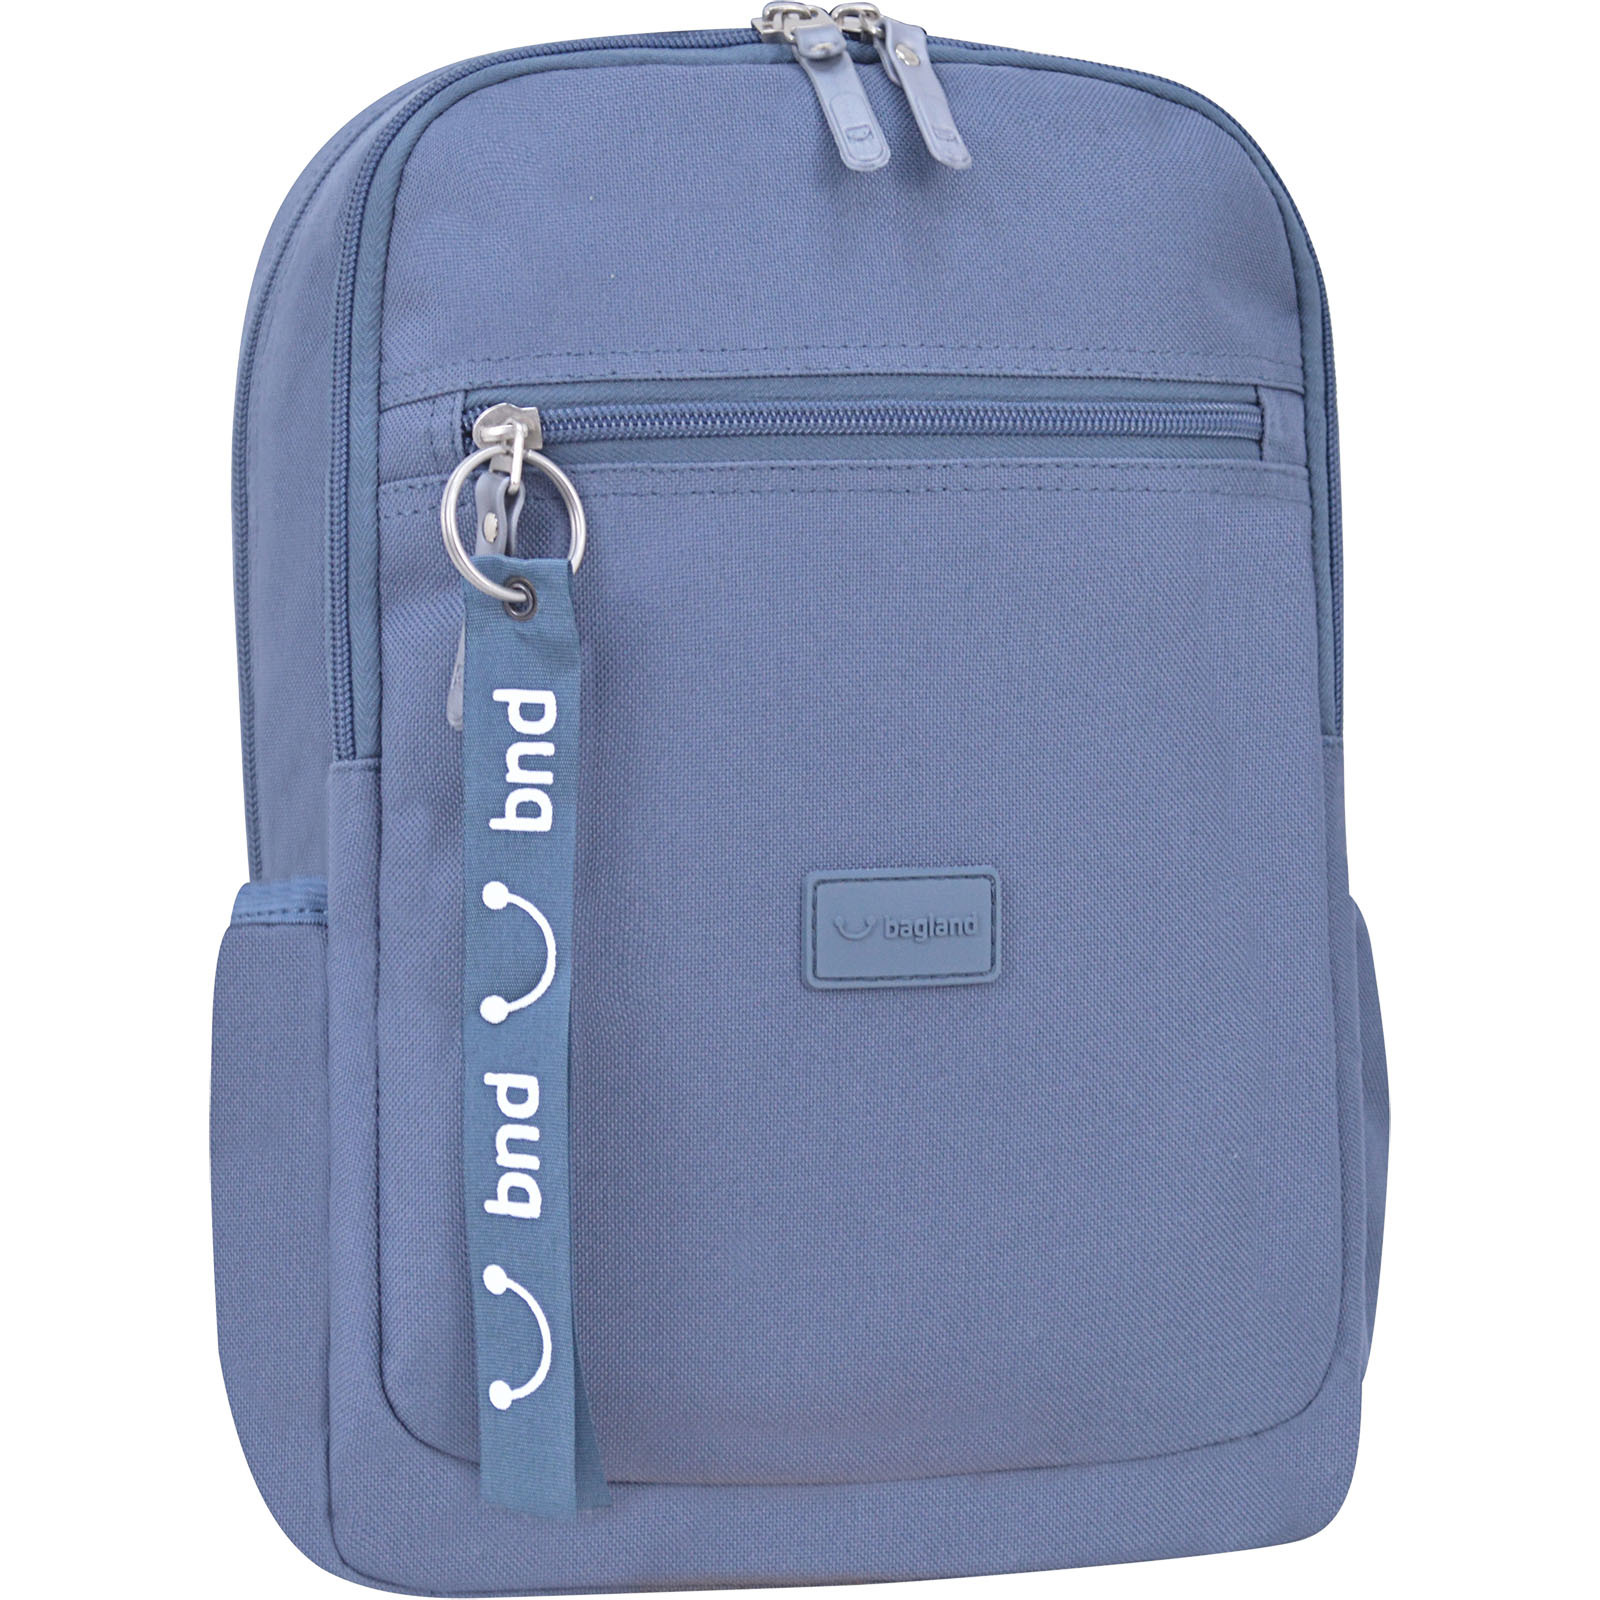 Детские рюкзаки Рюкзак Bagland Young 13 л. серый (0051066) DSC_1107-1600.jpg